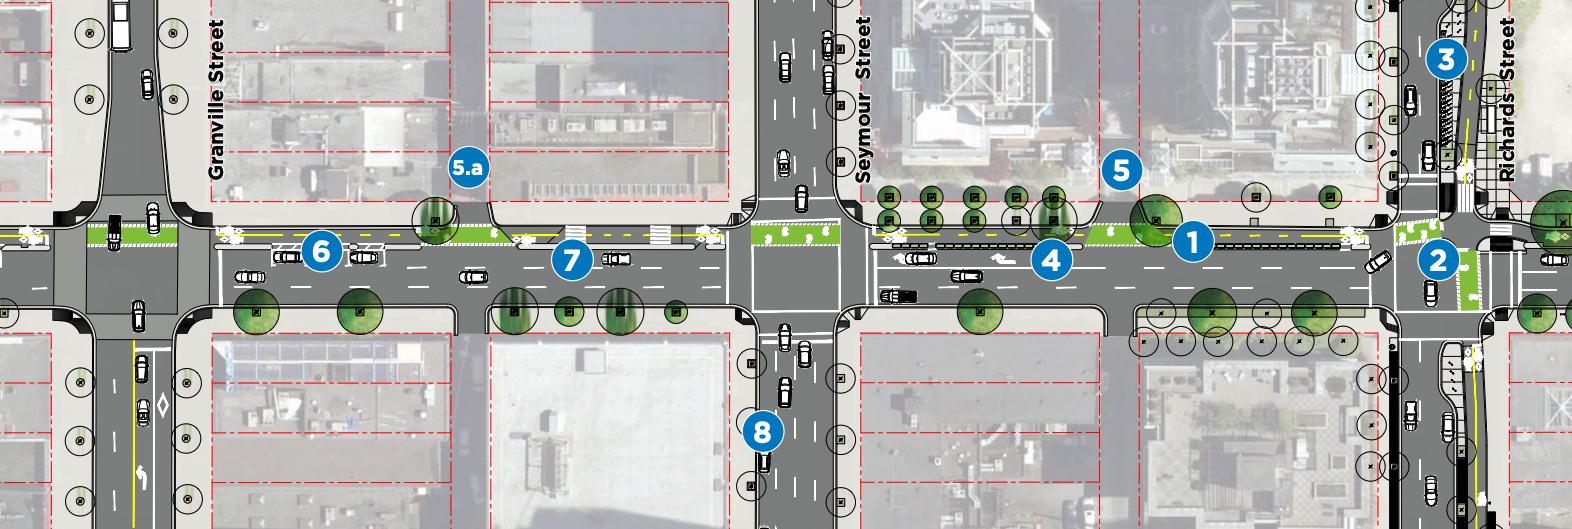 smithe street bike lane